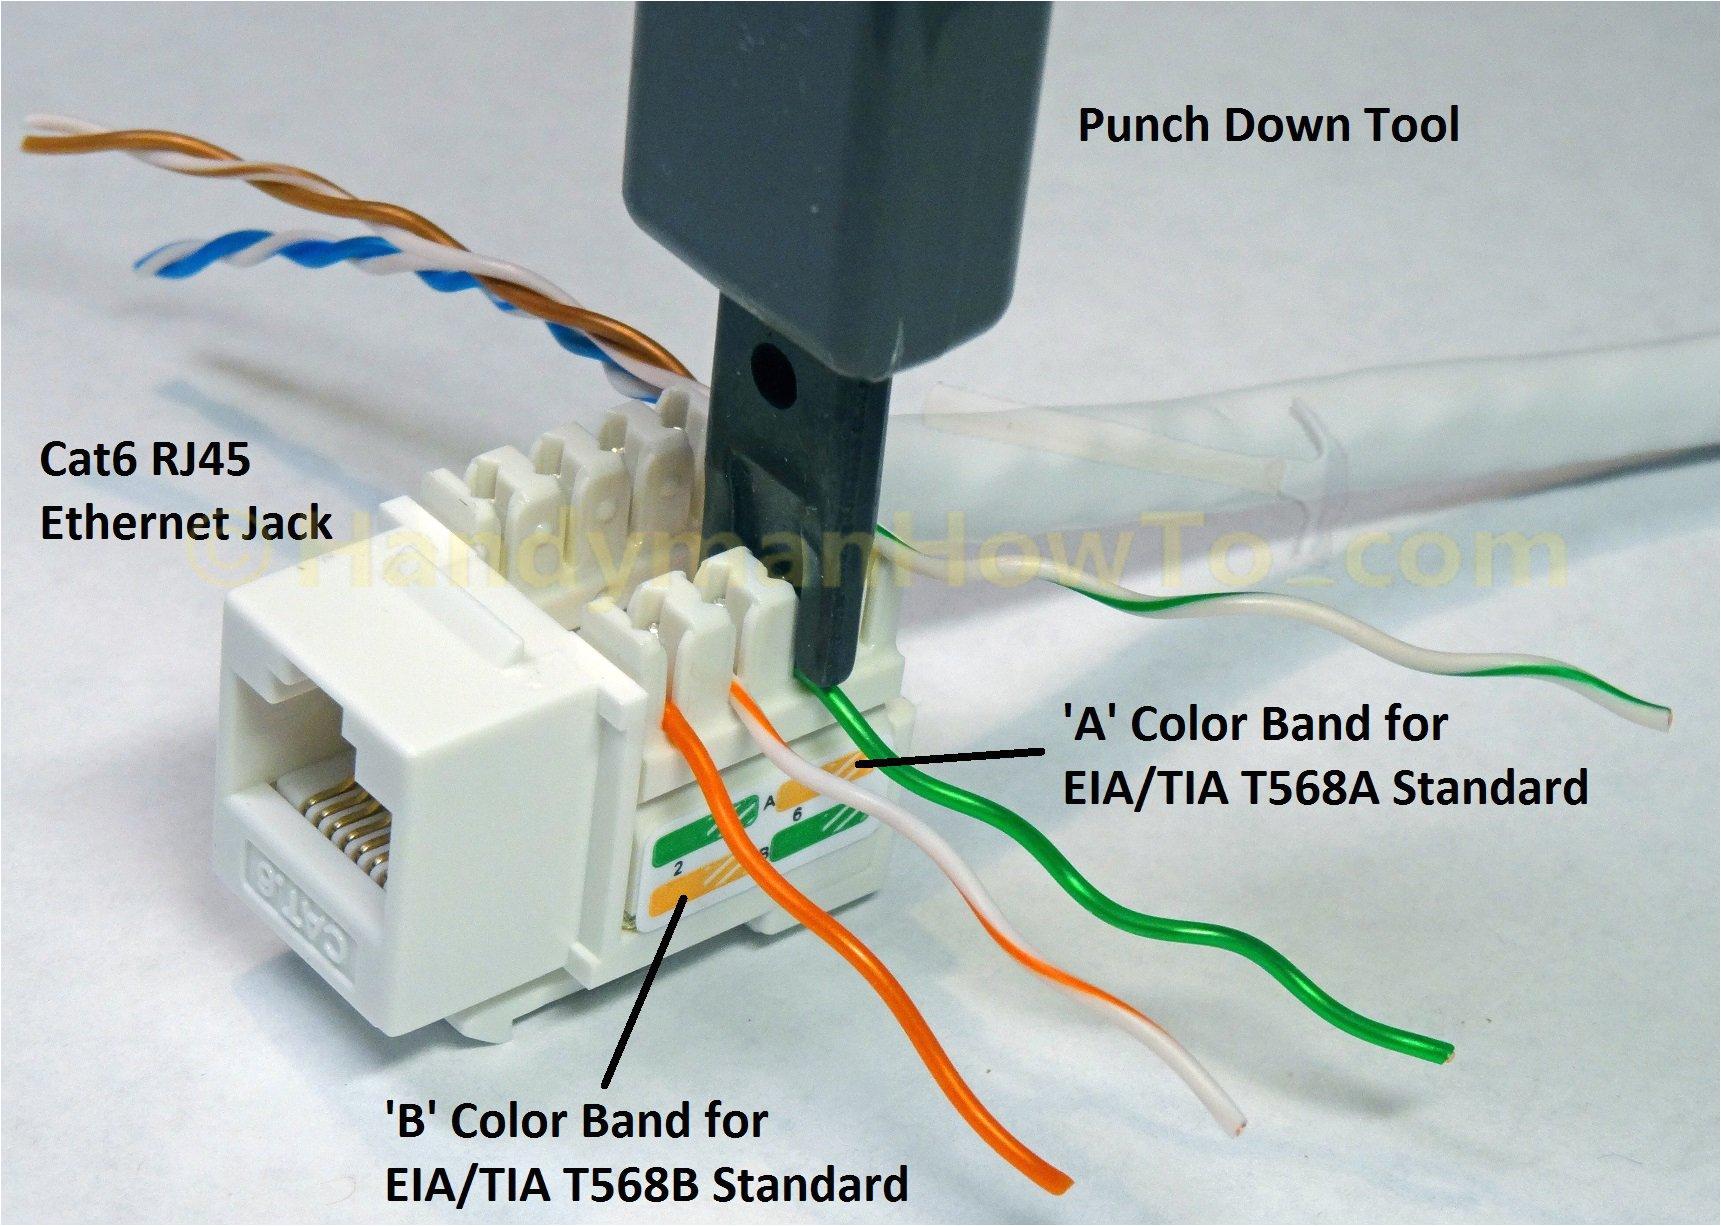 leviton cat6 jack wiring diagram best of cat 6 ethernet wall socket wiring diagram cat6 rj45 new network of leviton cat6 jack wiring diagram in leviton cat6 jack wiring diagram jpg